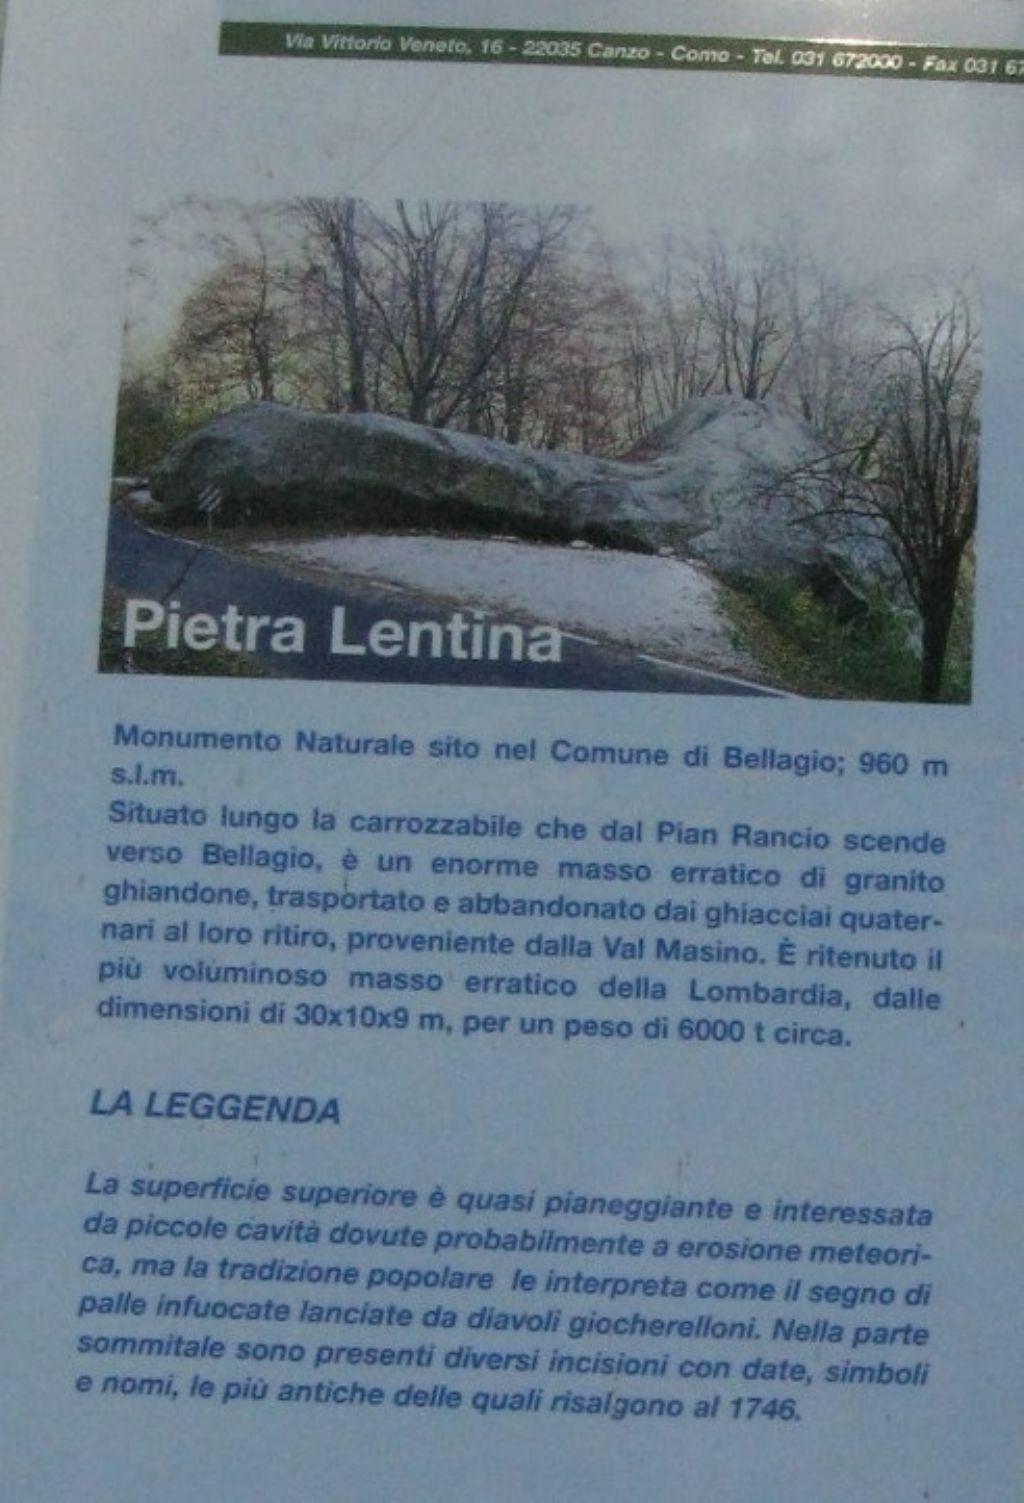 Pietra Lentina